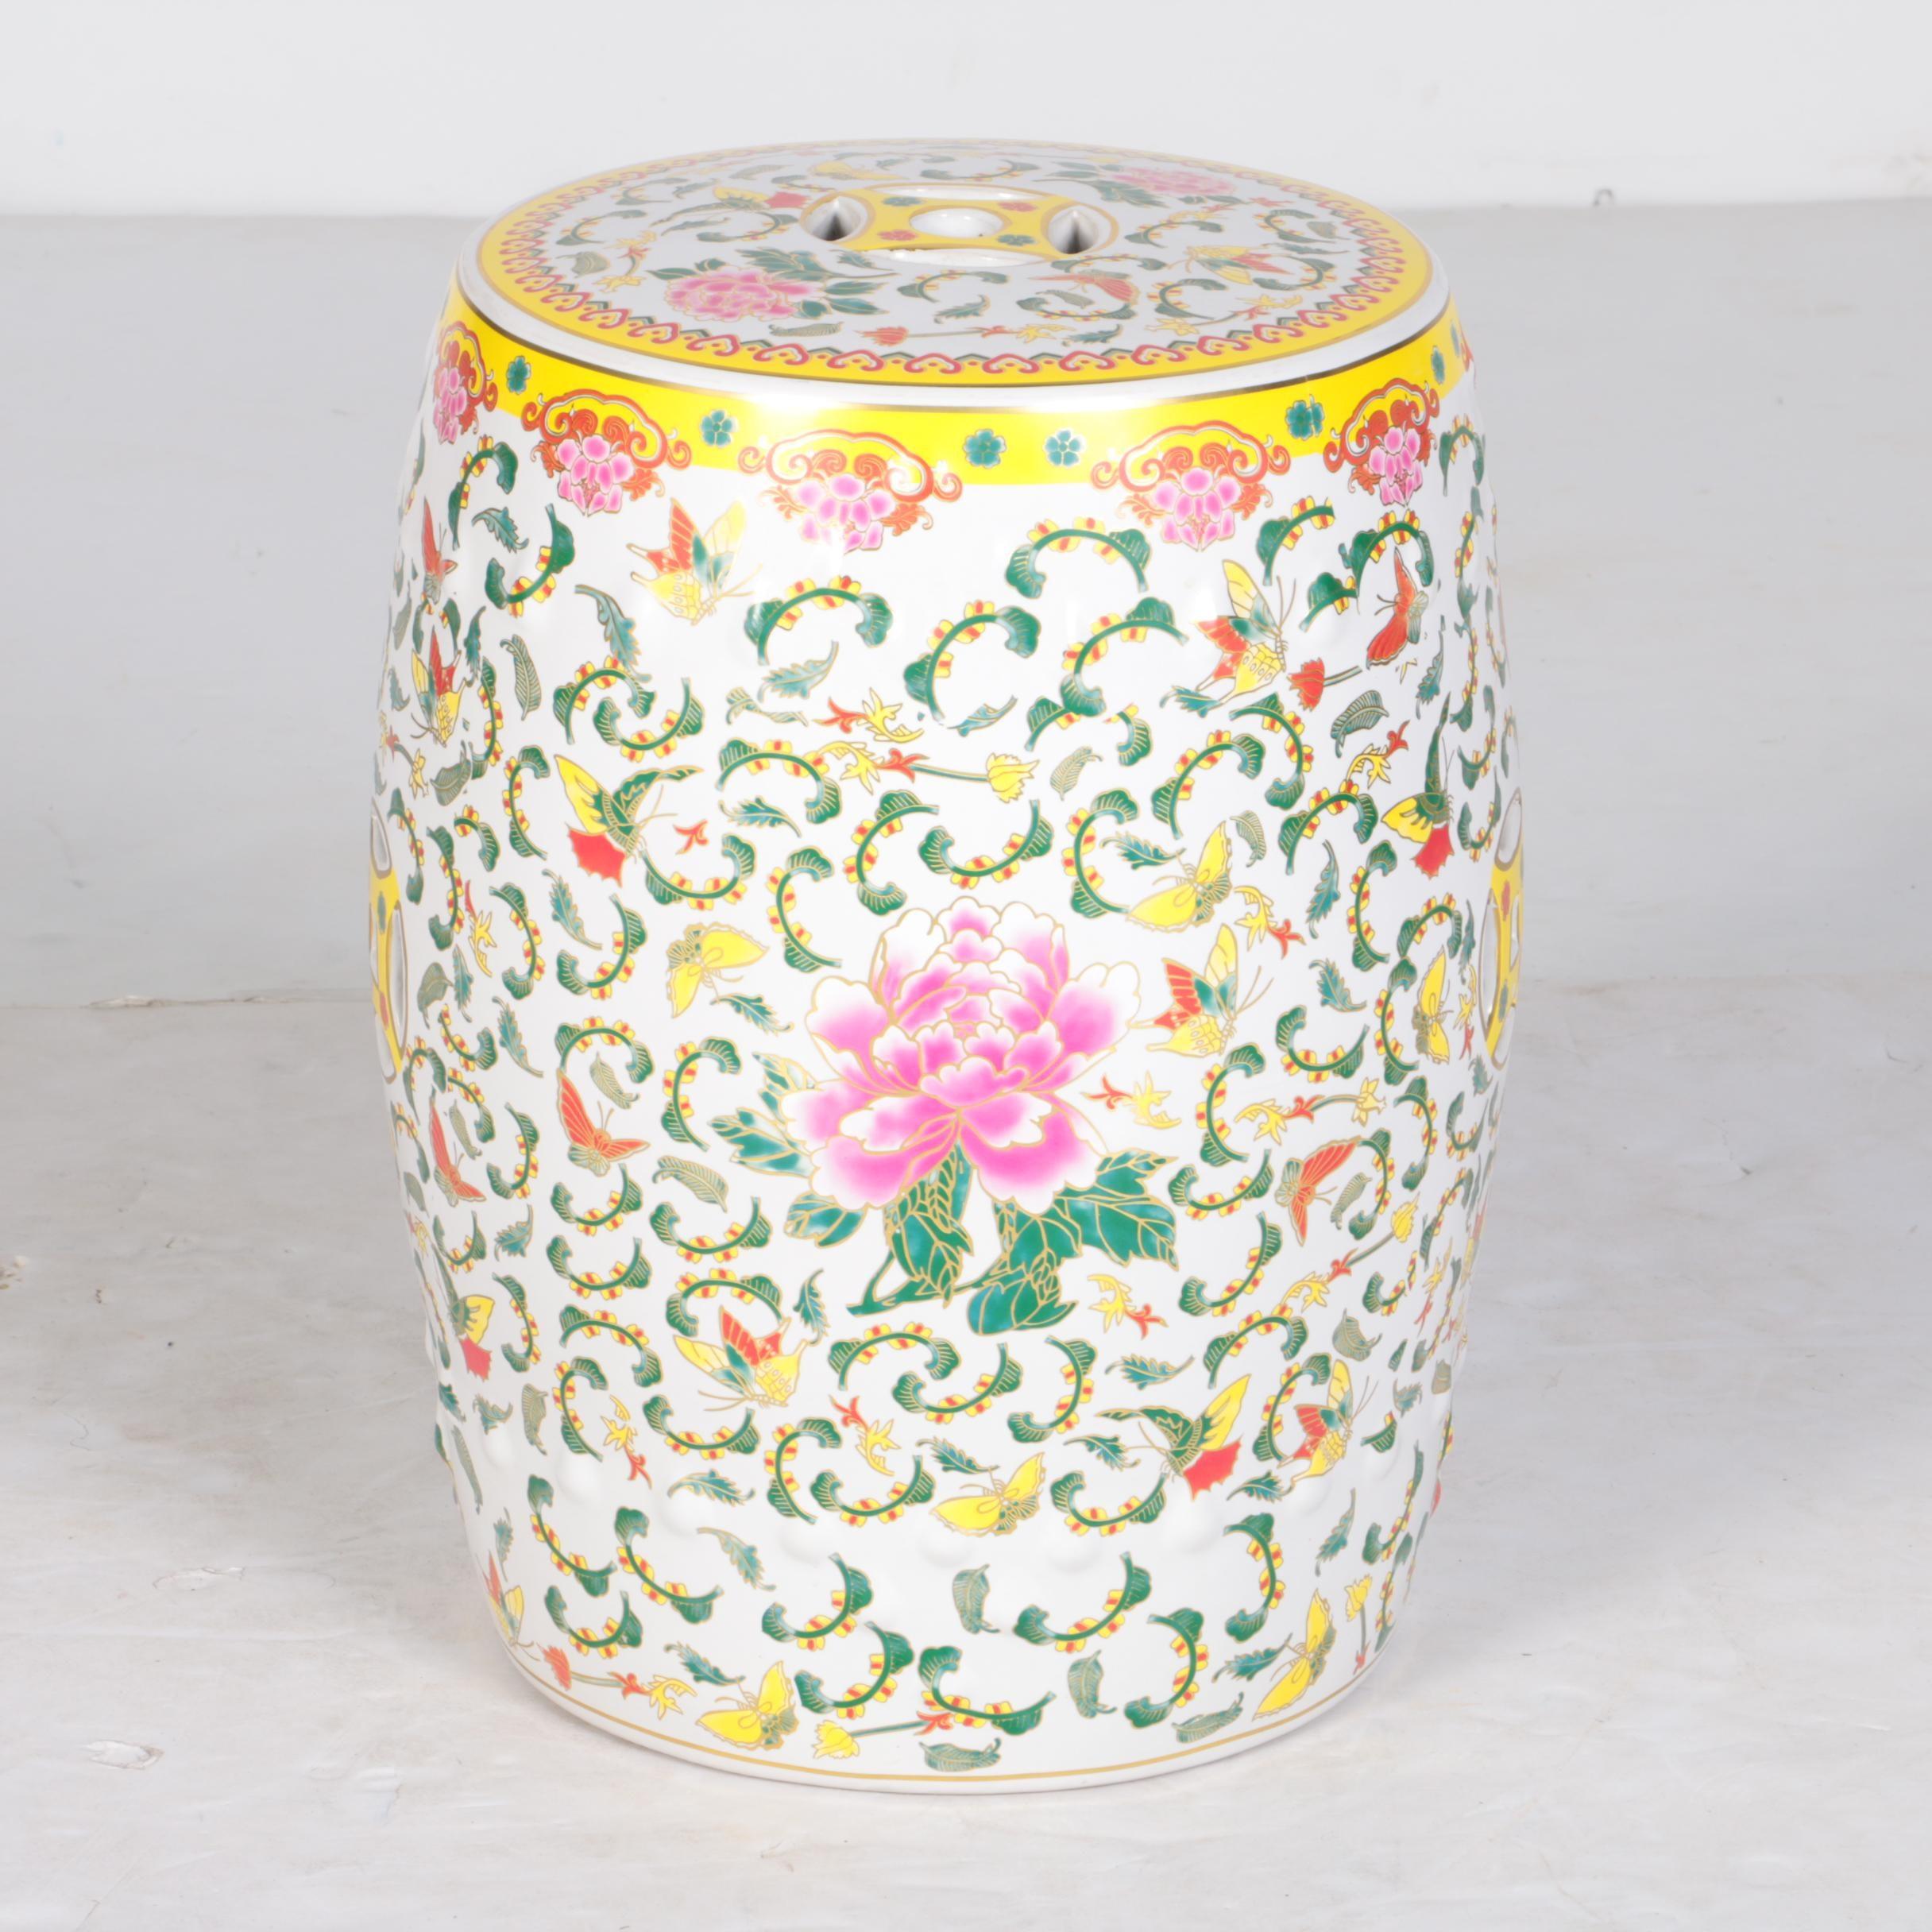 Chinese Decorative Ceramic Garden Stool